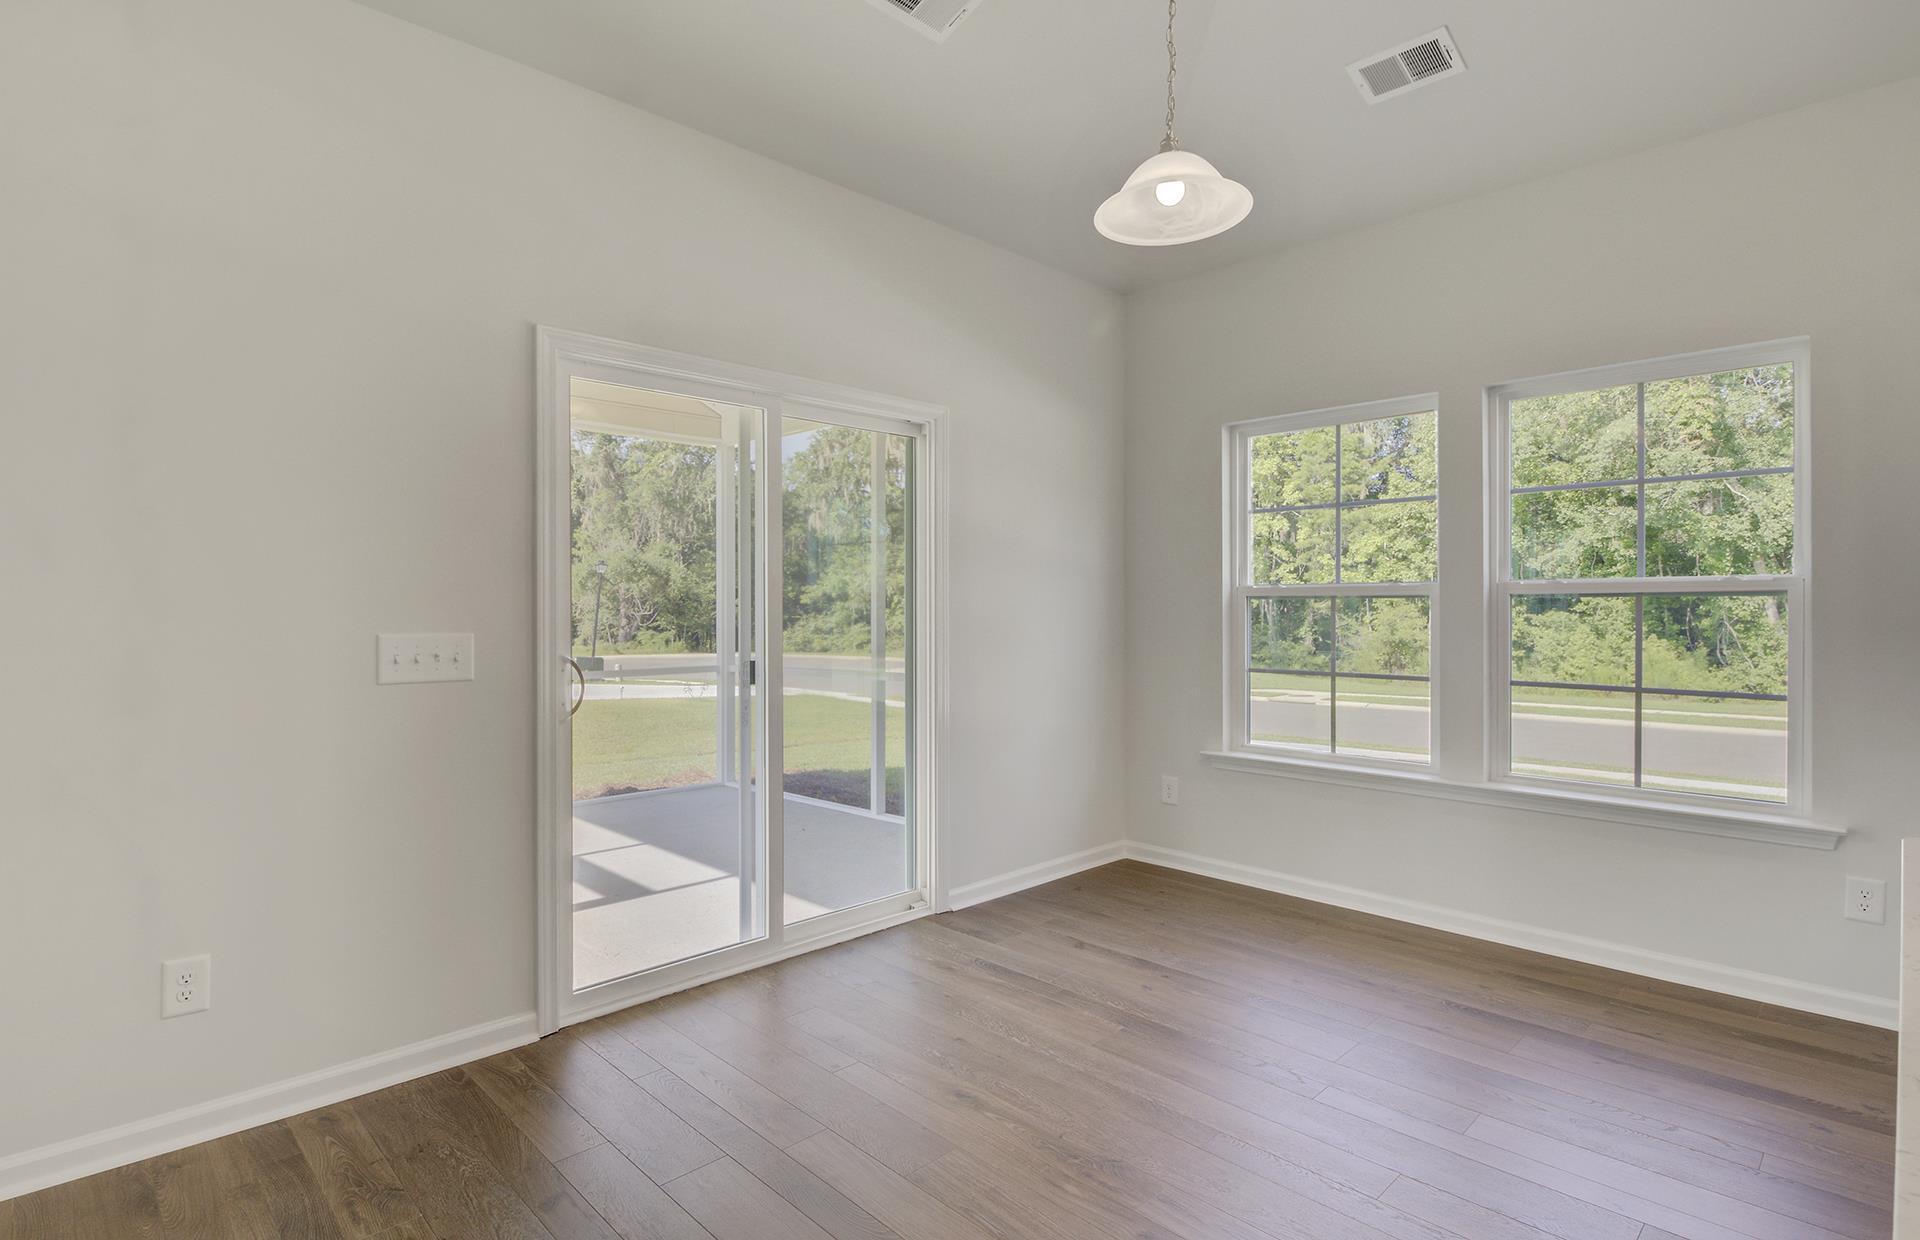 Cane Bay Plantation Homes For Sale - 205 Granton Edge, Summerville, SC - 17